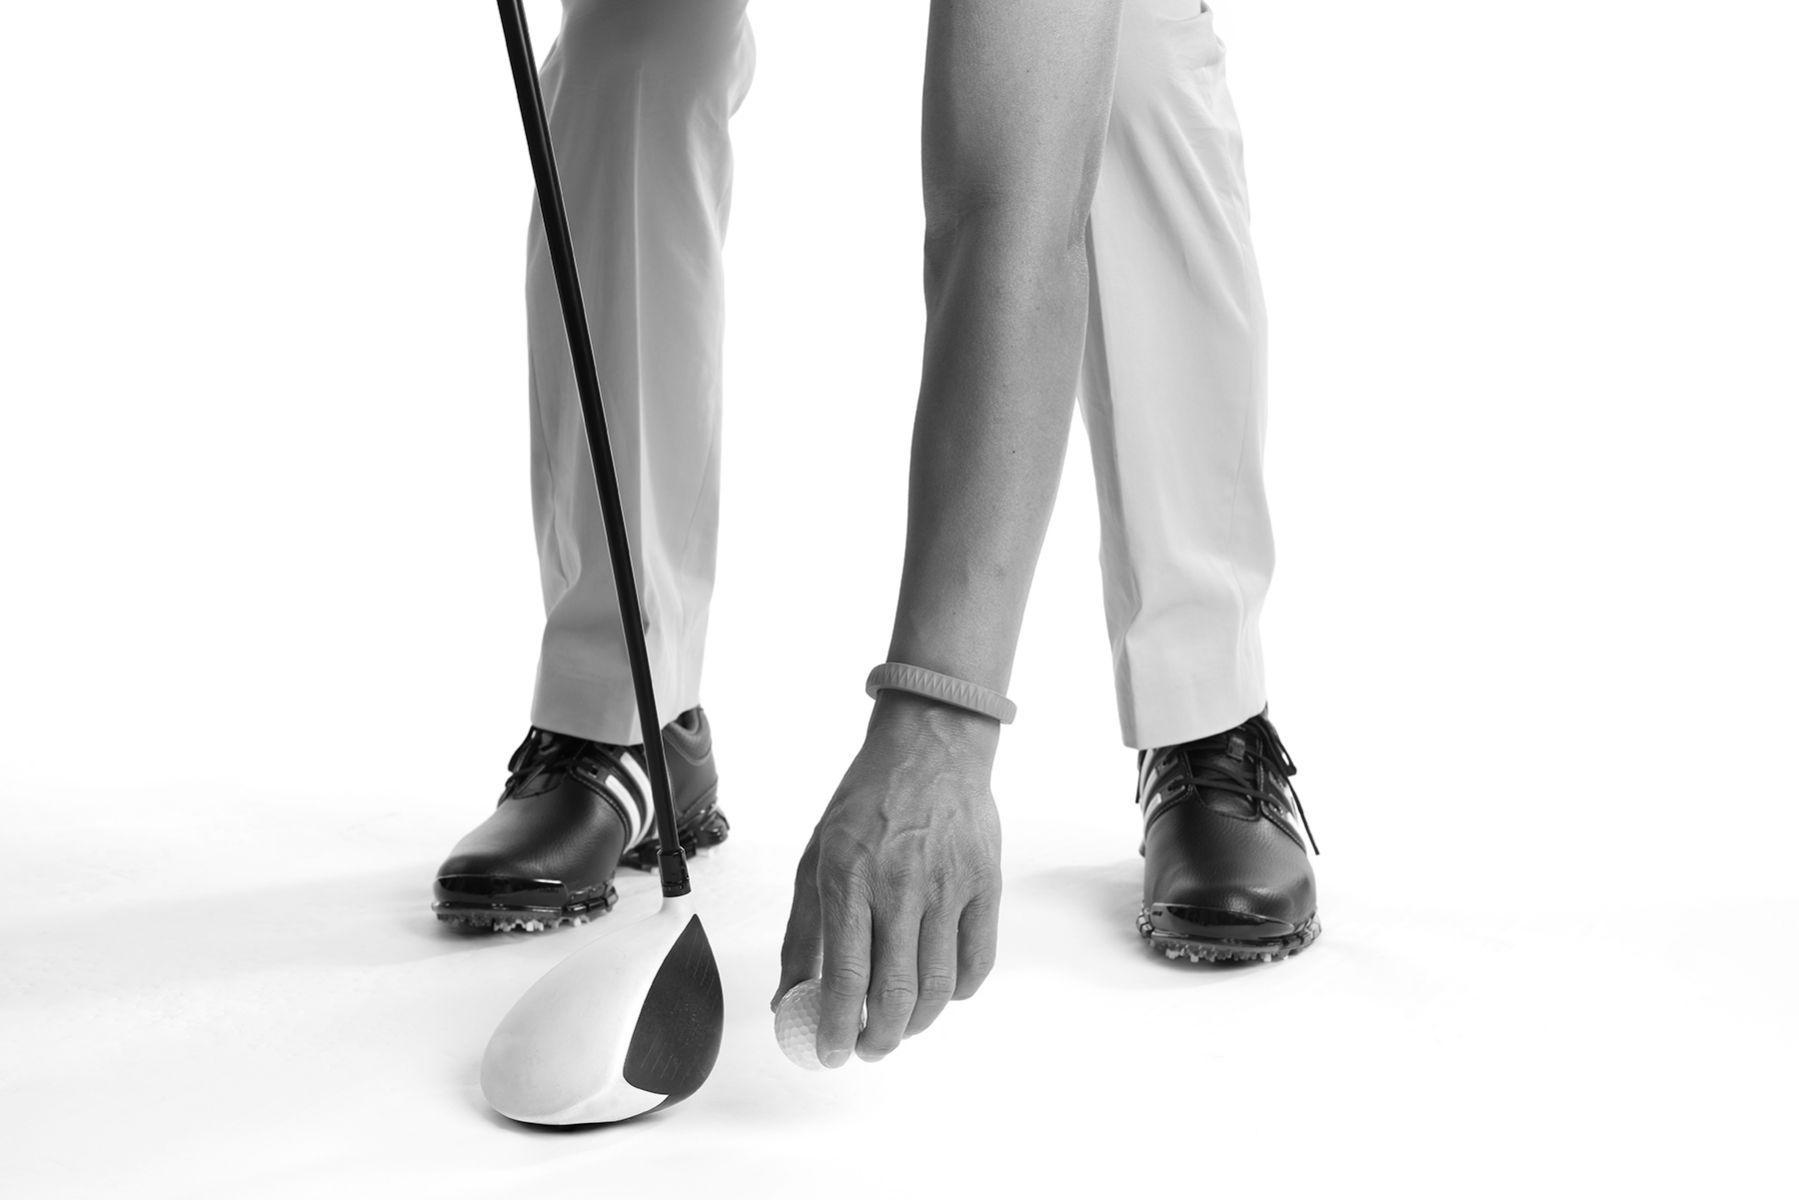 GolferThe ABD Team